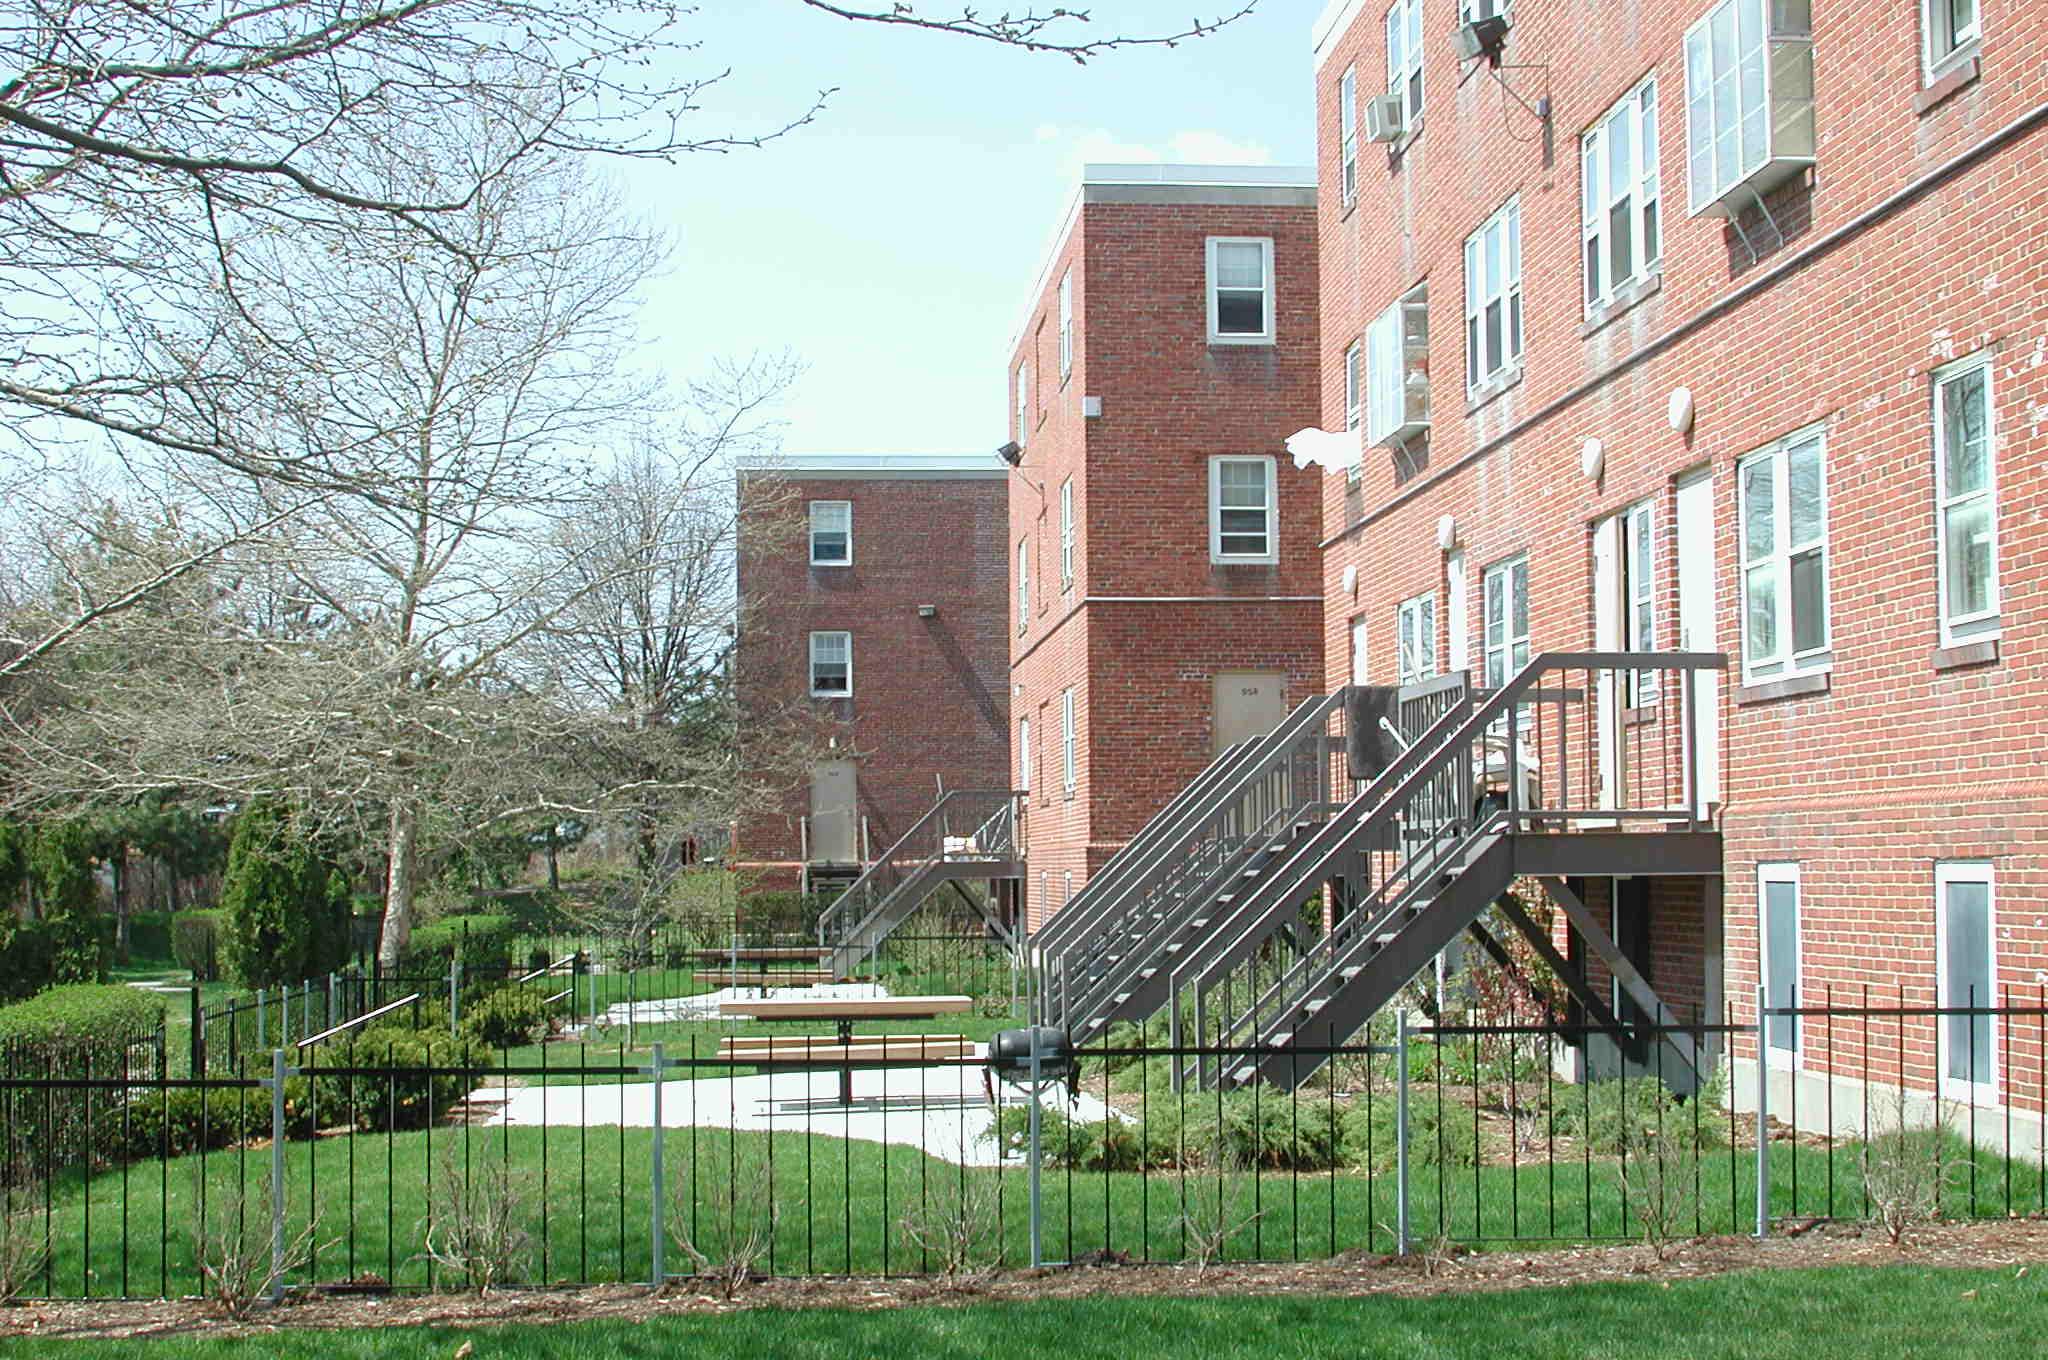 Image of Jefferson Park in Cambridge, Massachusetts